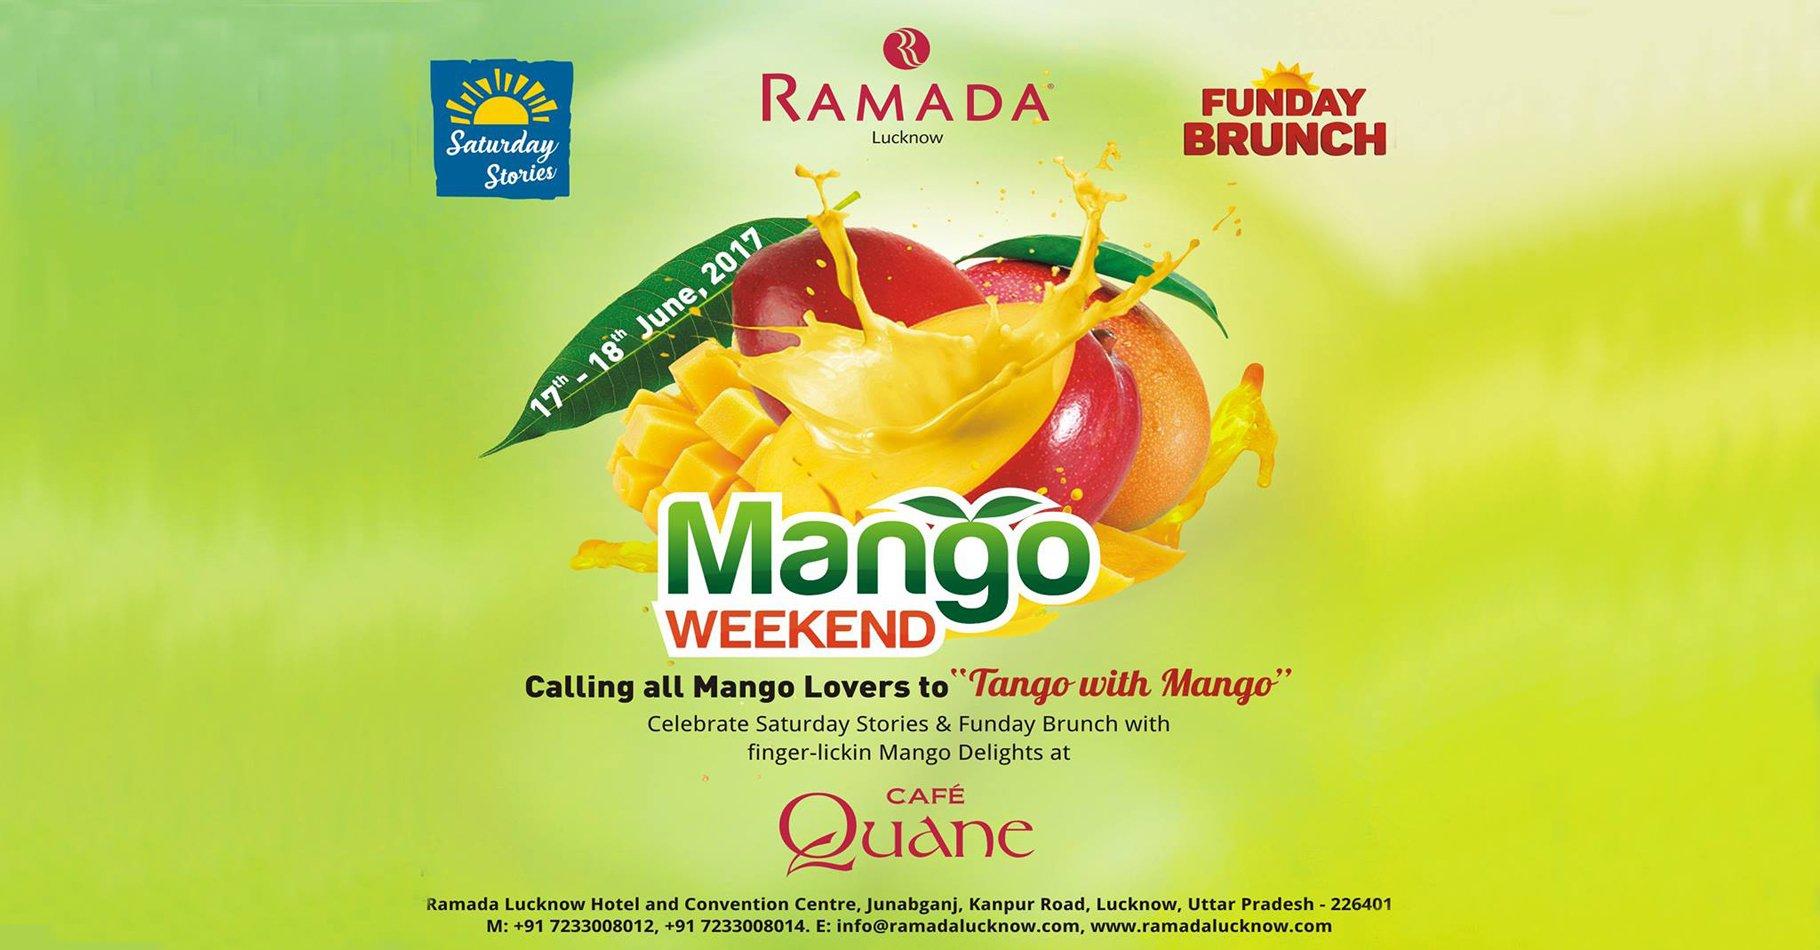 Mango-Weekend-June-17-18-2017-Ramada-Lucknow